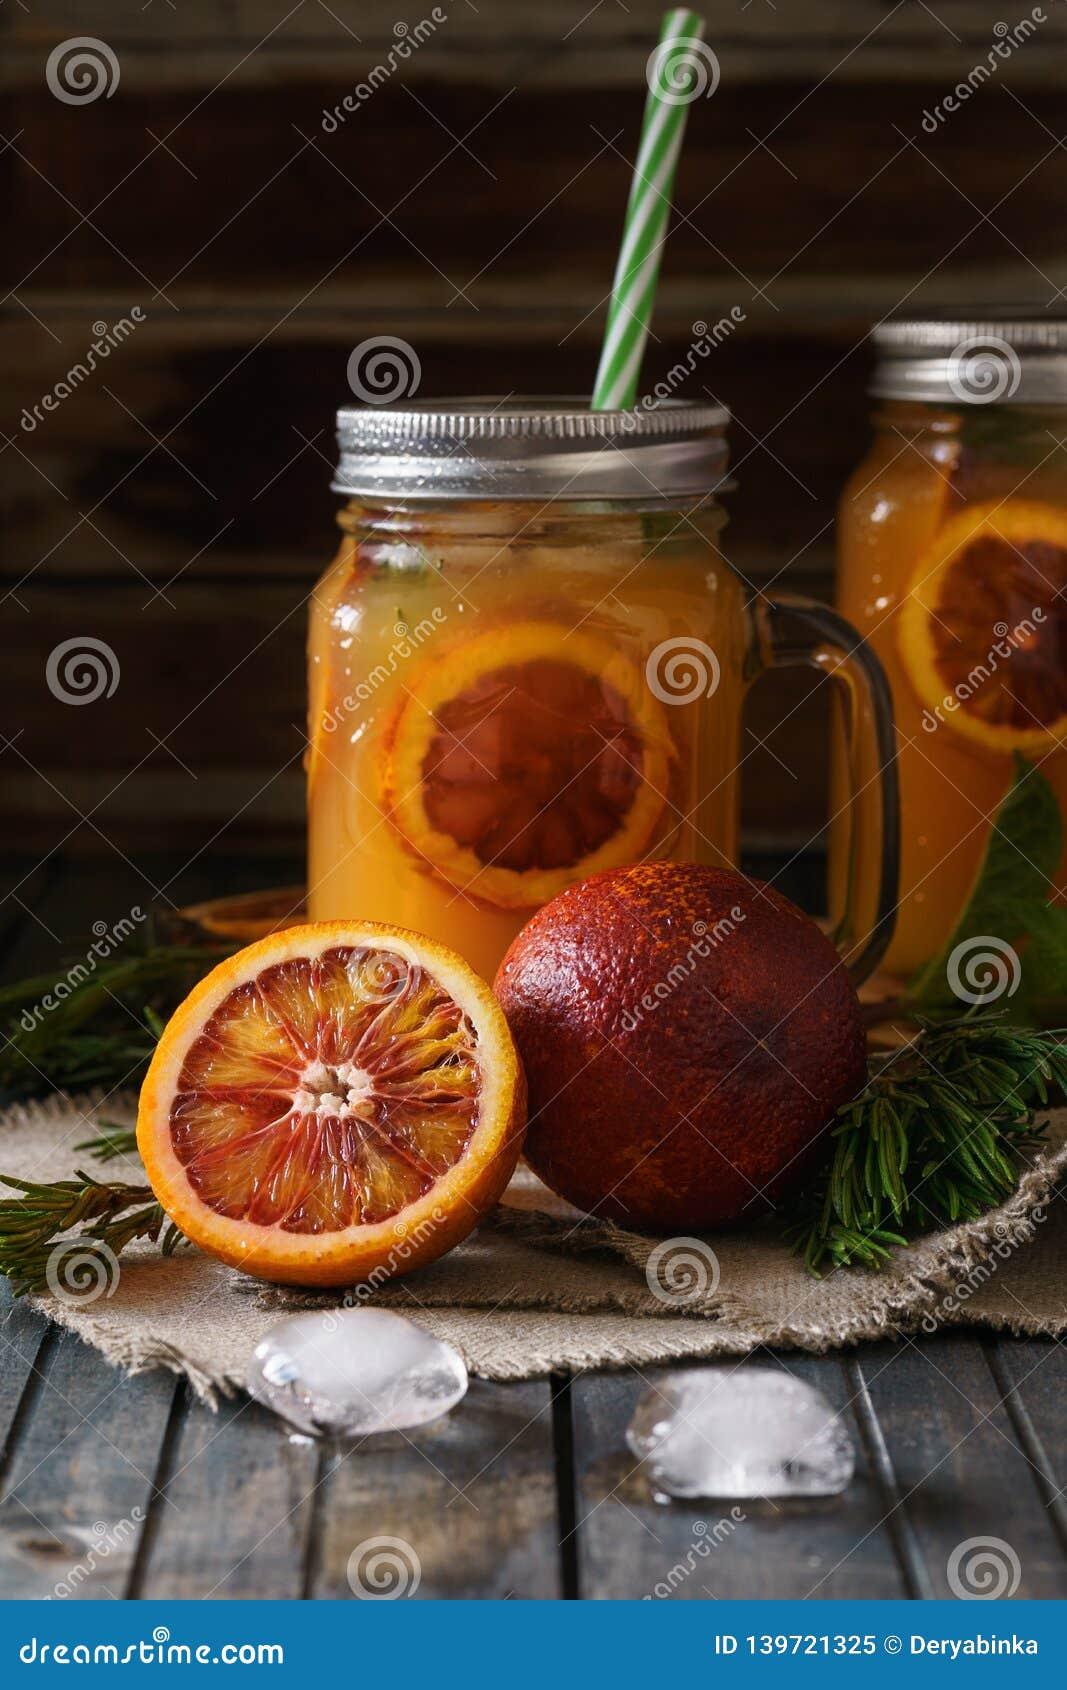 Blood orange juice with ice and orange slice